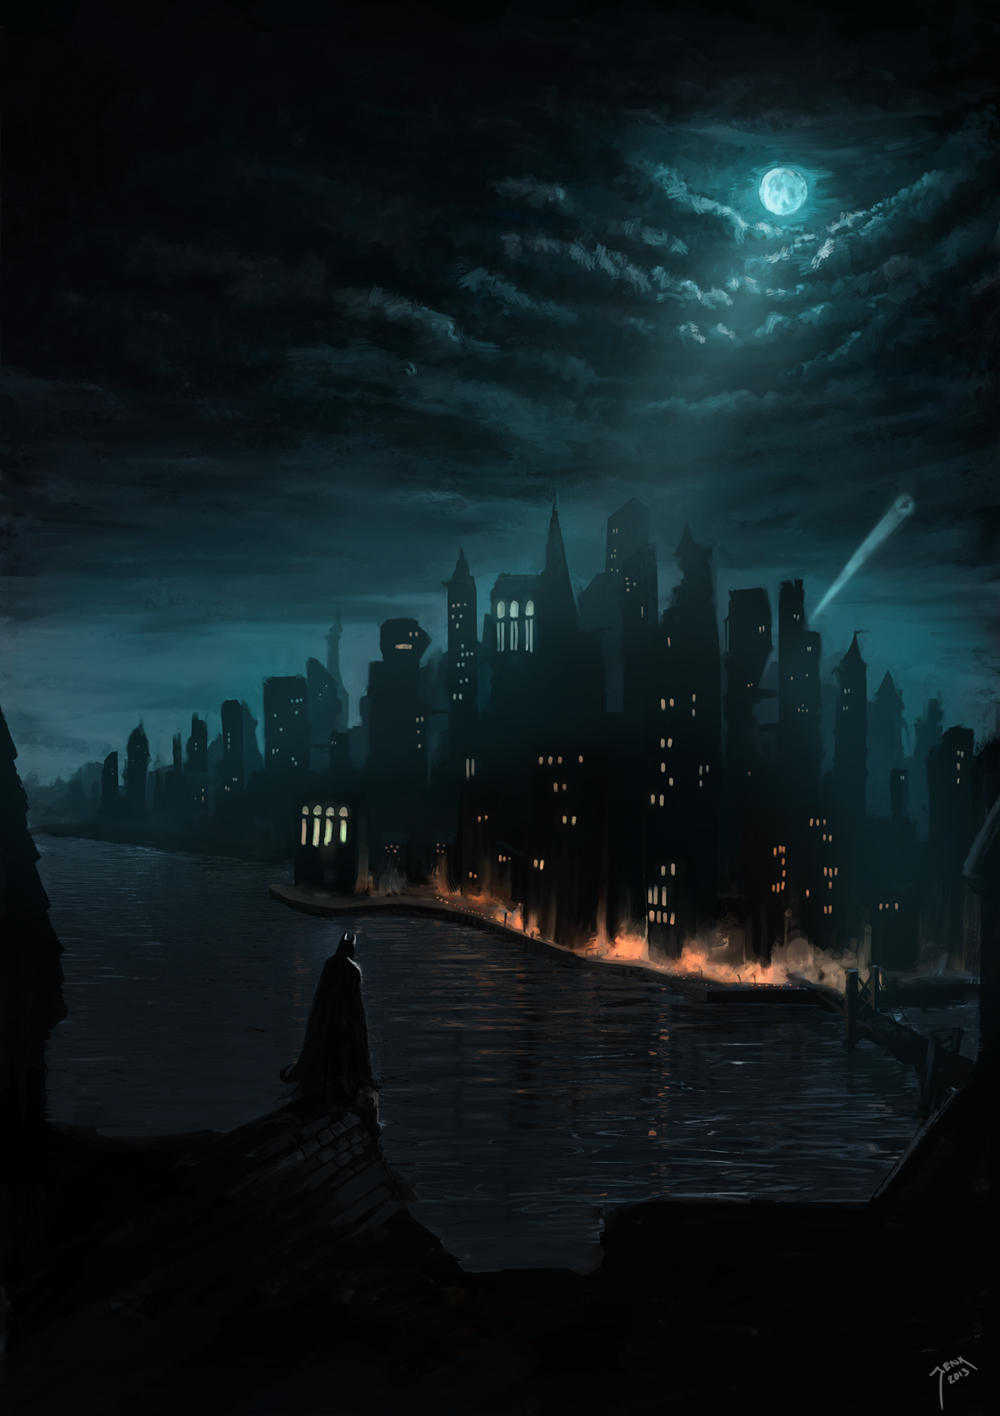 Batman 2a by Robjenx